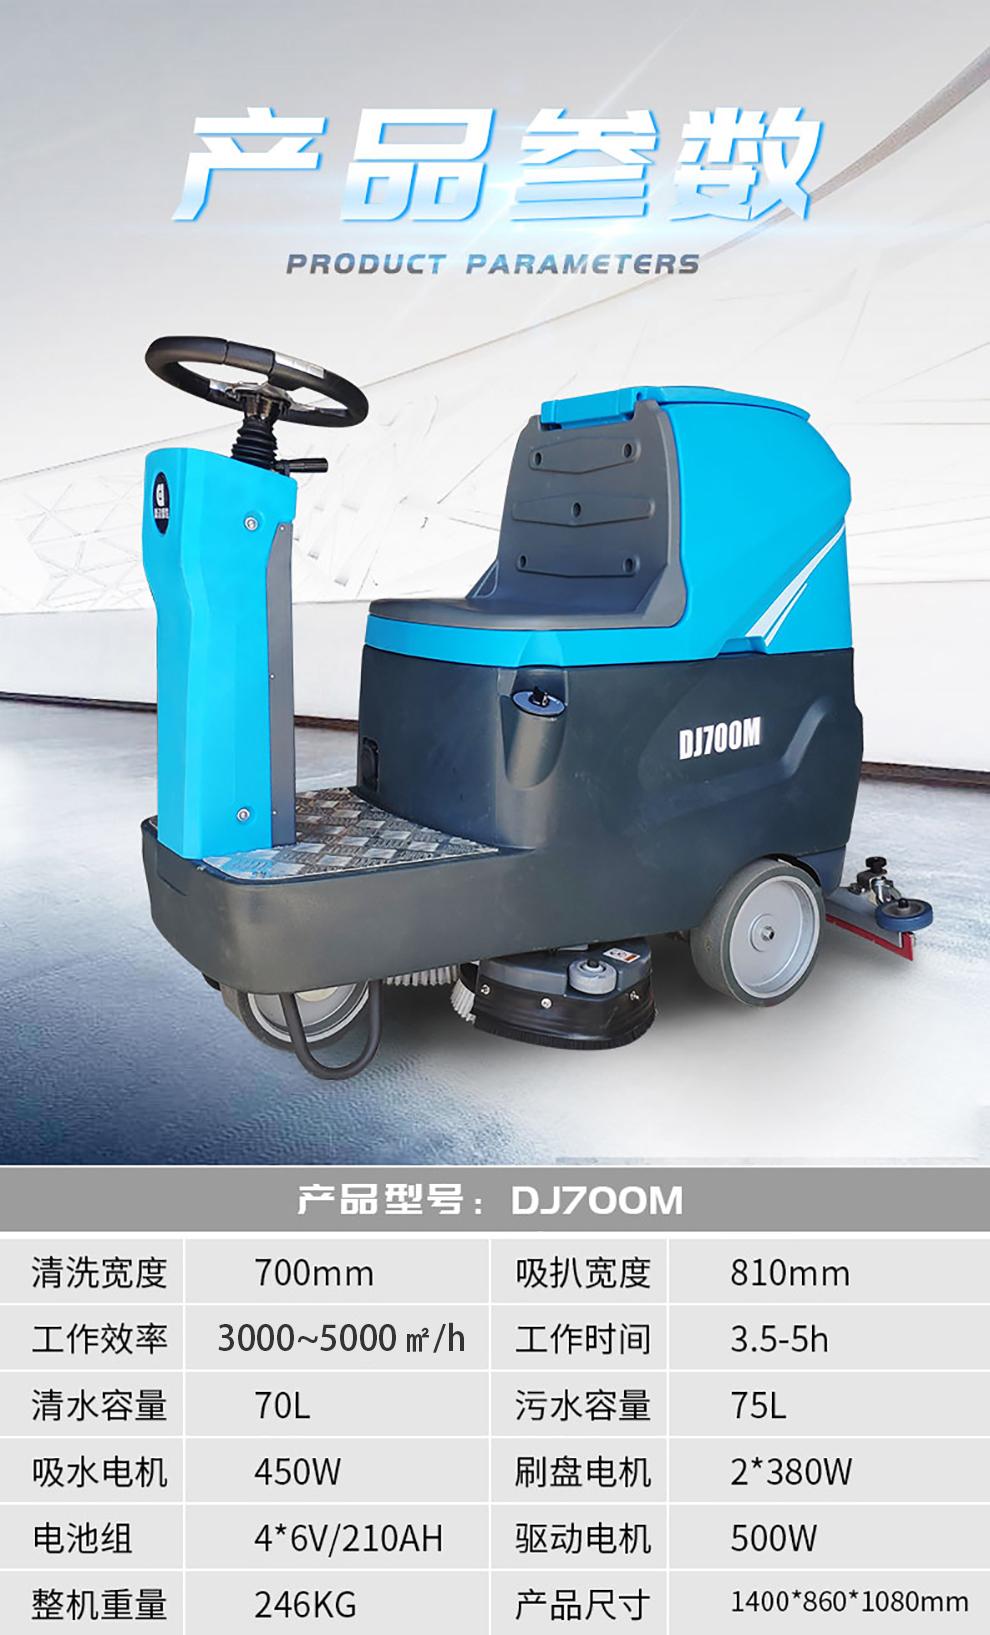 DJ700M  山东驾驶式洗地机-驾驶式洗地车 (双刷静音)29